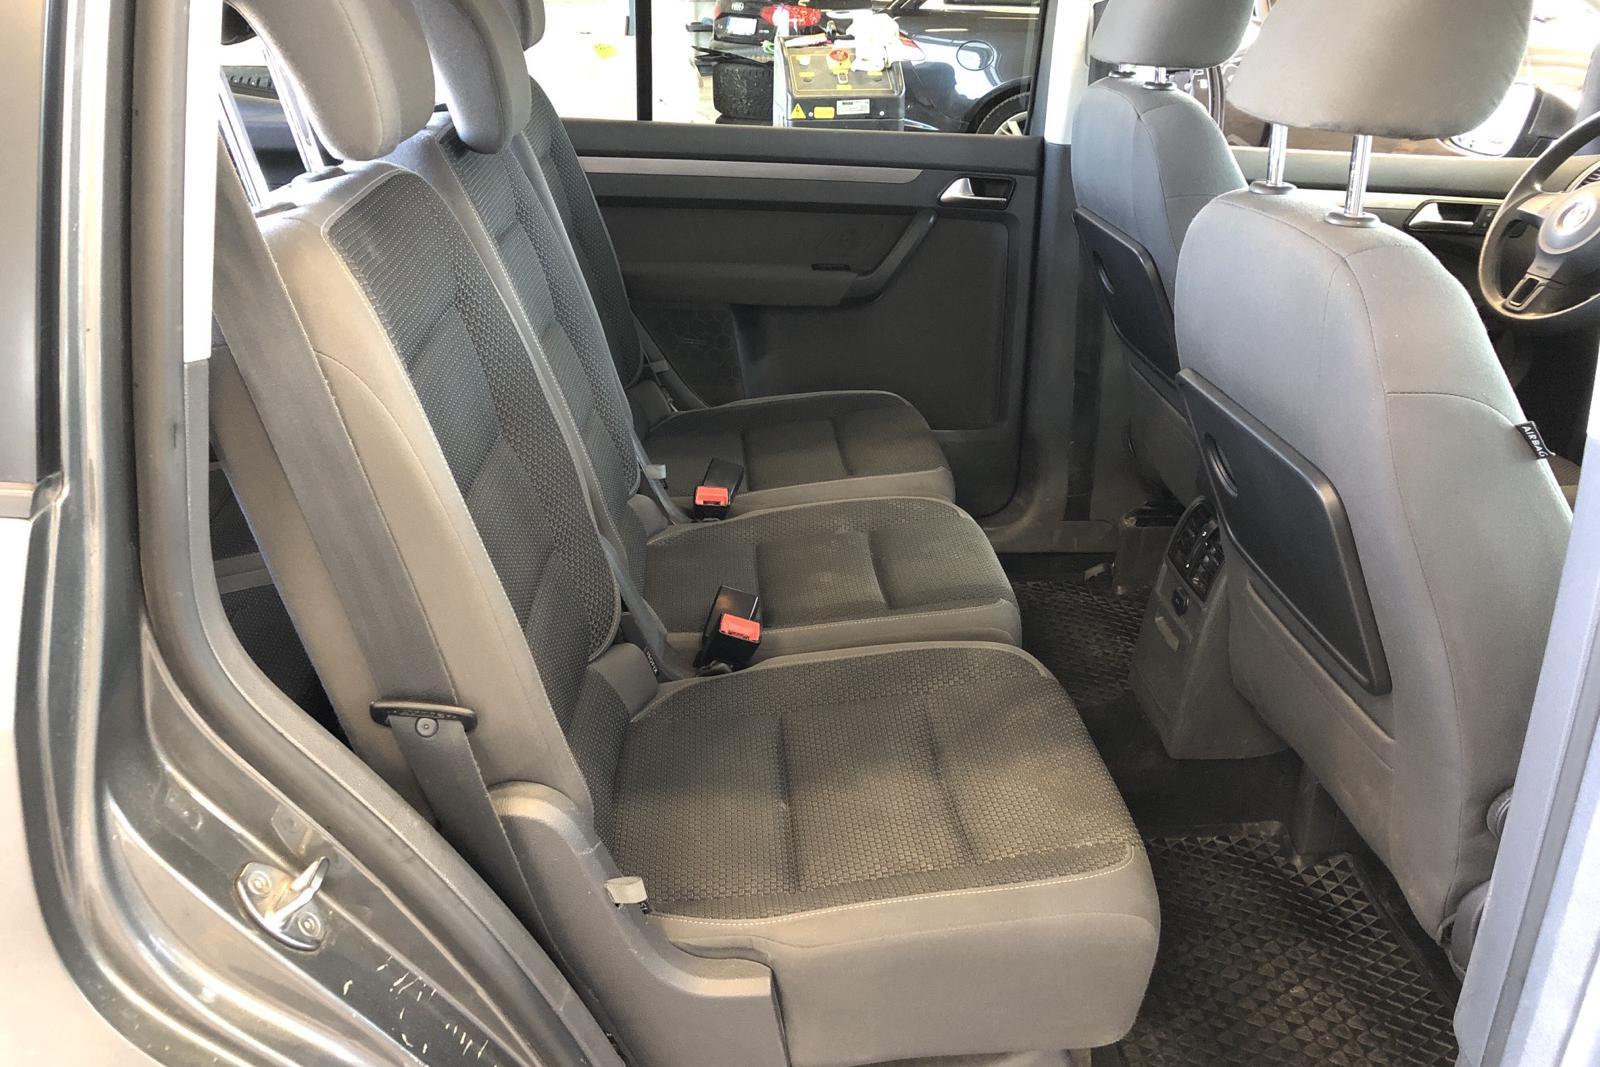 VW Touran 1.4 TGI EcoFuel (150hk) - 162 160 km - Manual - Dark Grey - 2011